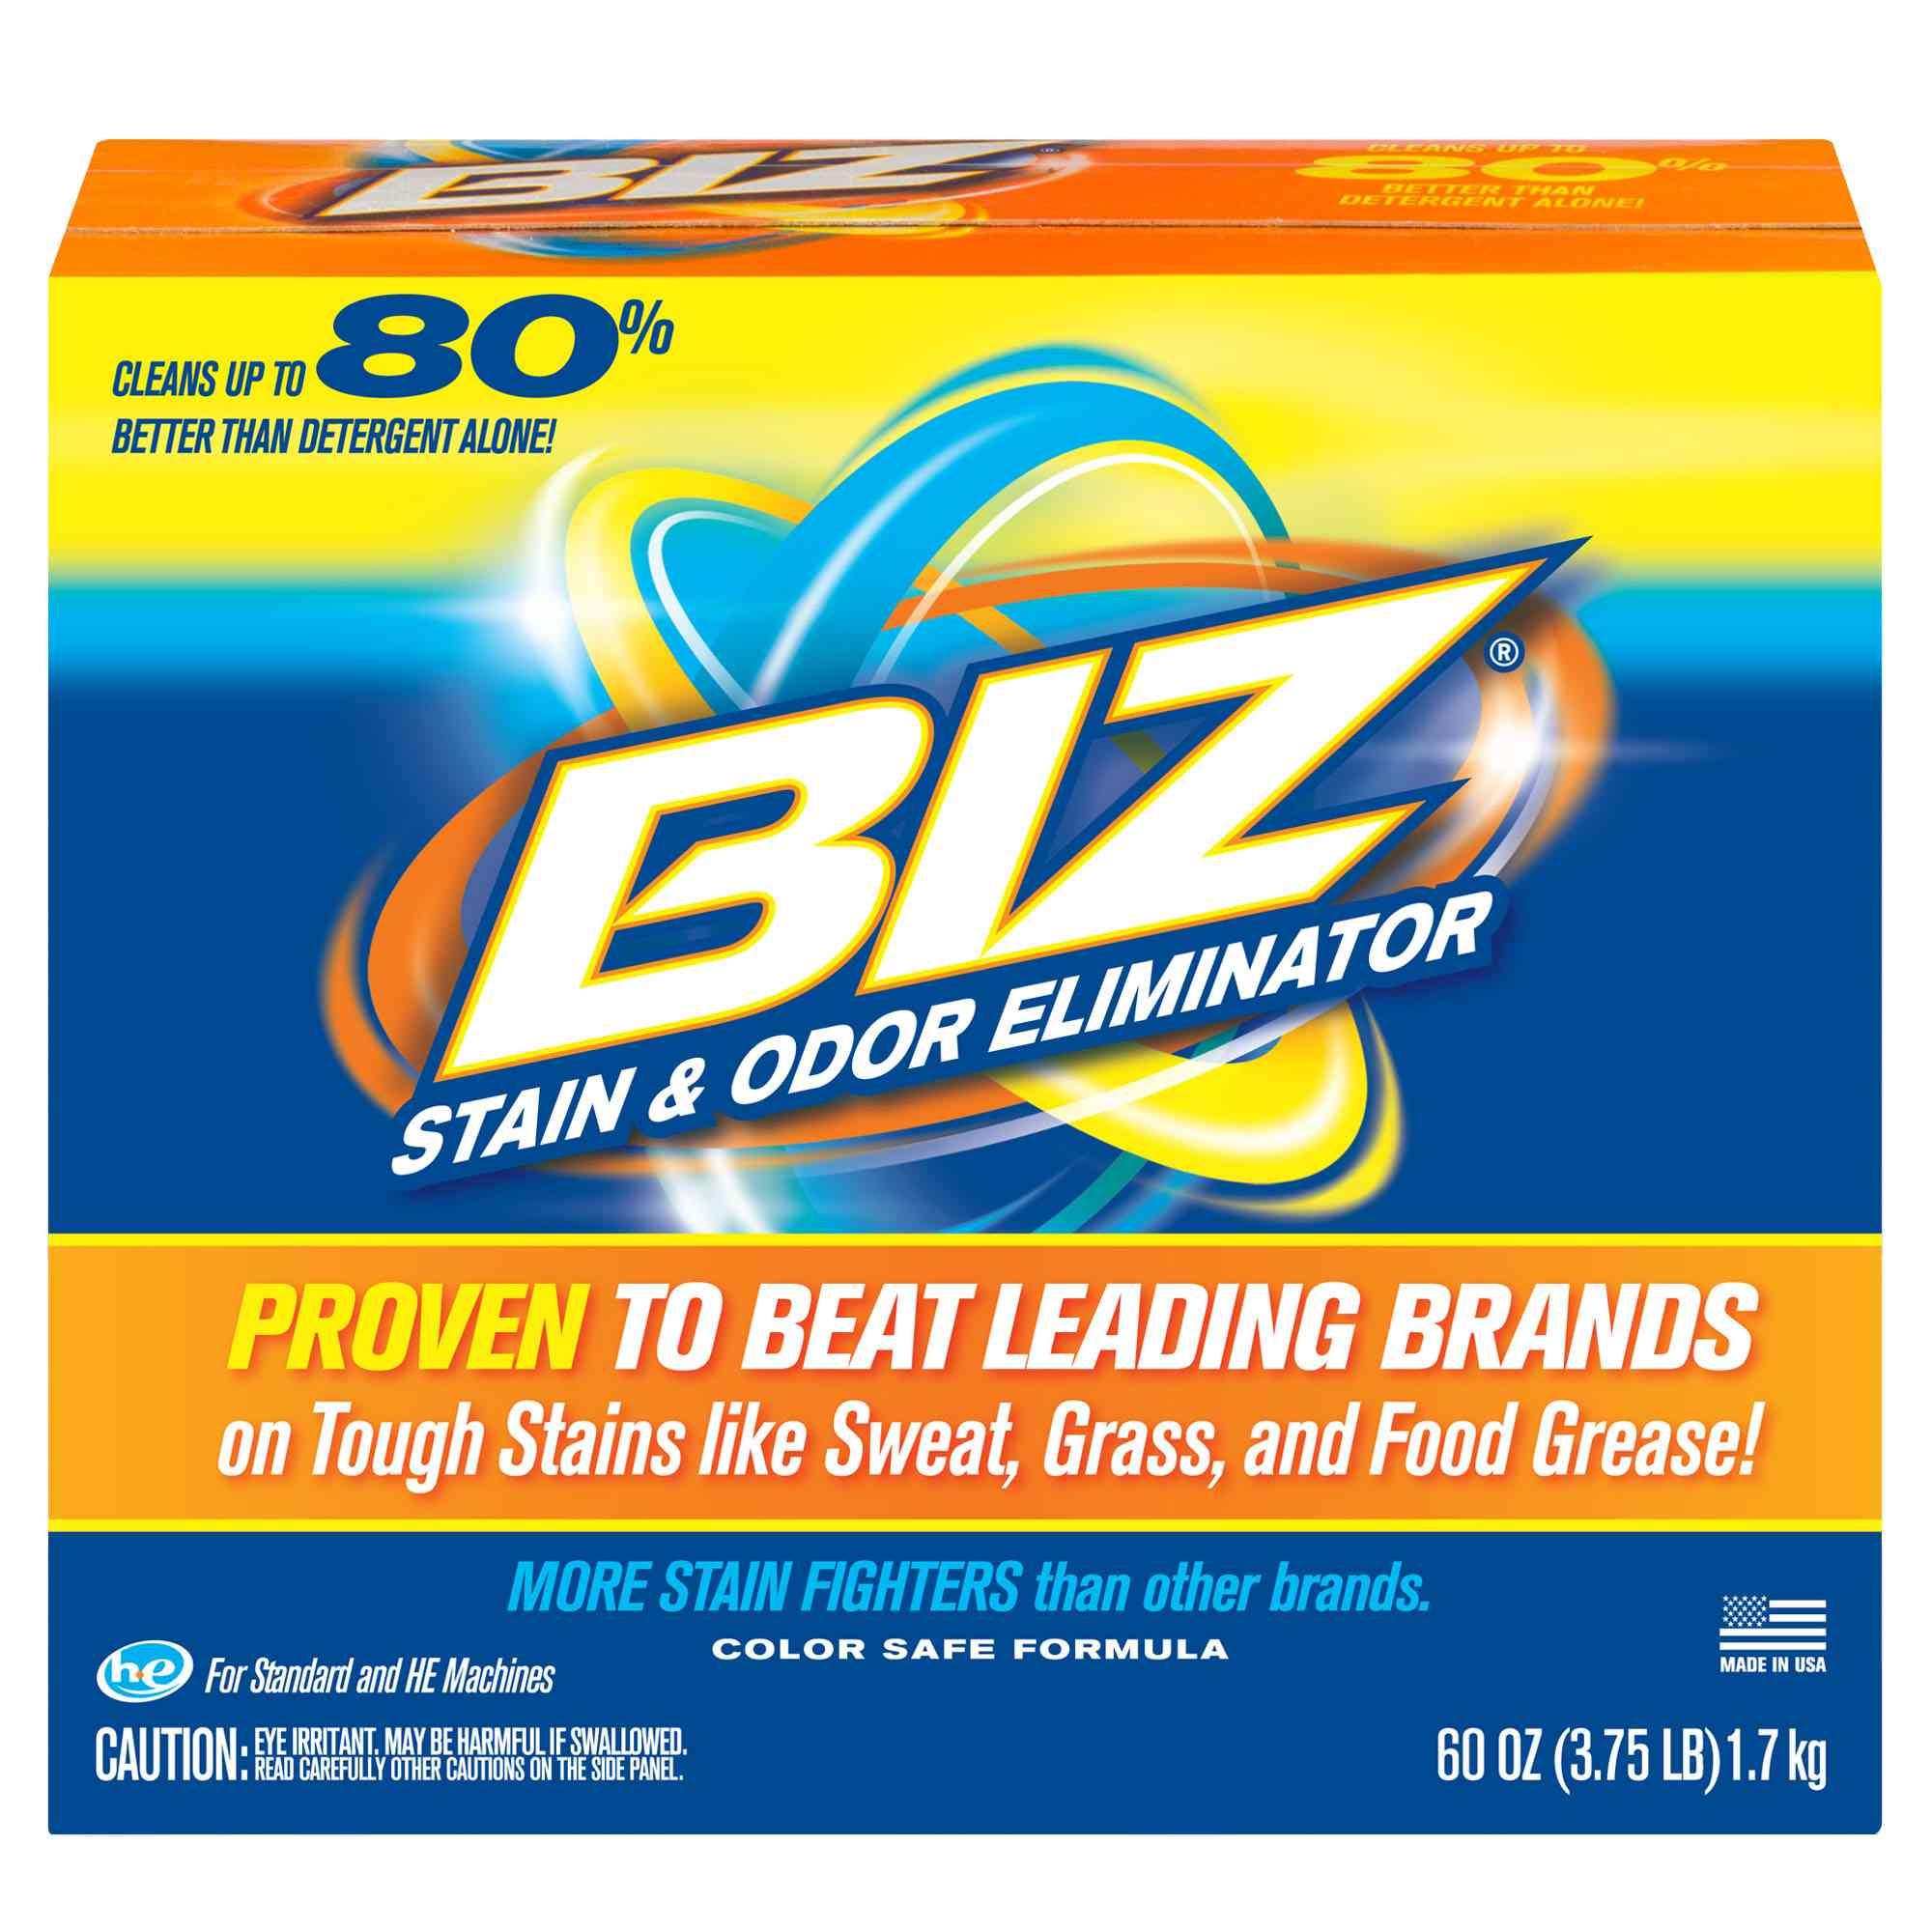 Biz-Stain-Odor-Eliminator